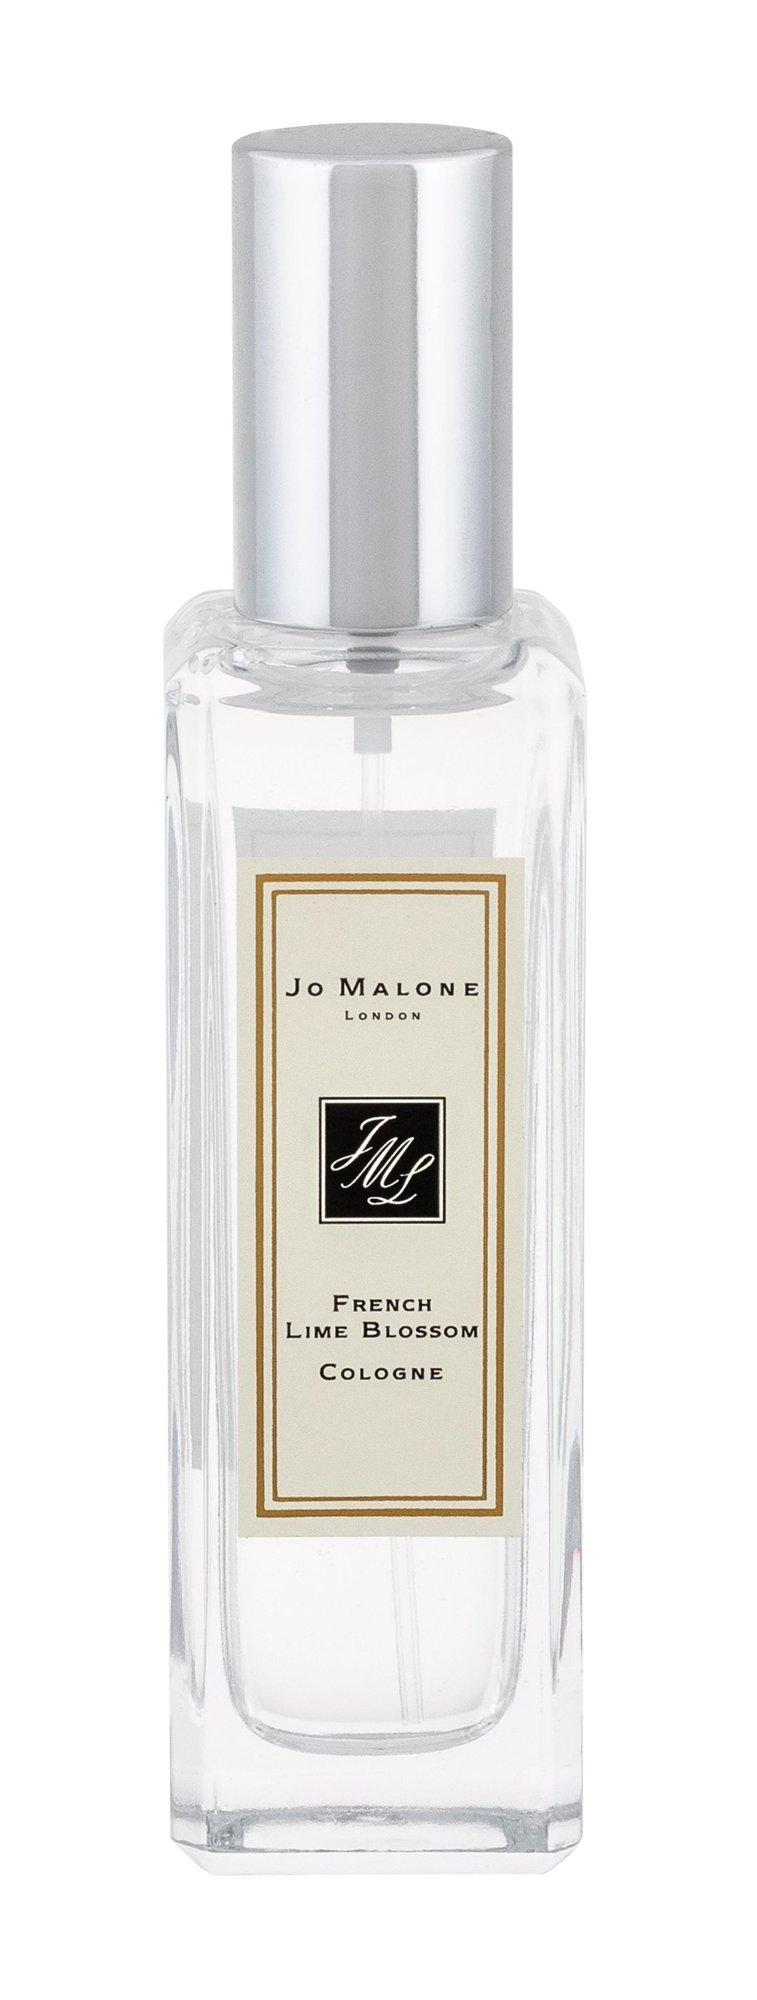 Jo Malone French Lime Blossom Eau de Cologne 30ml